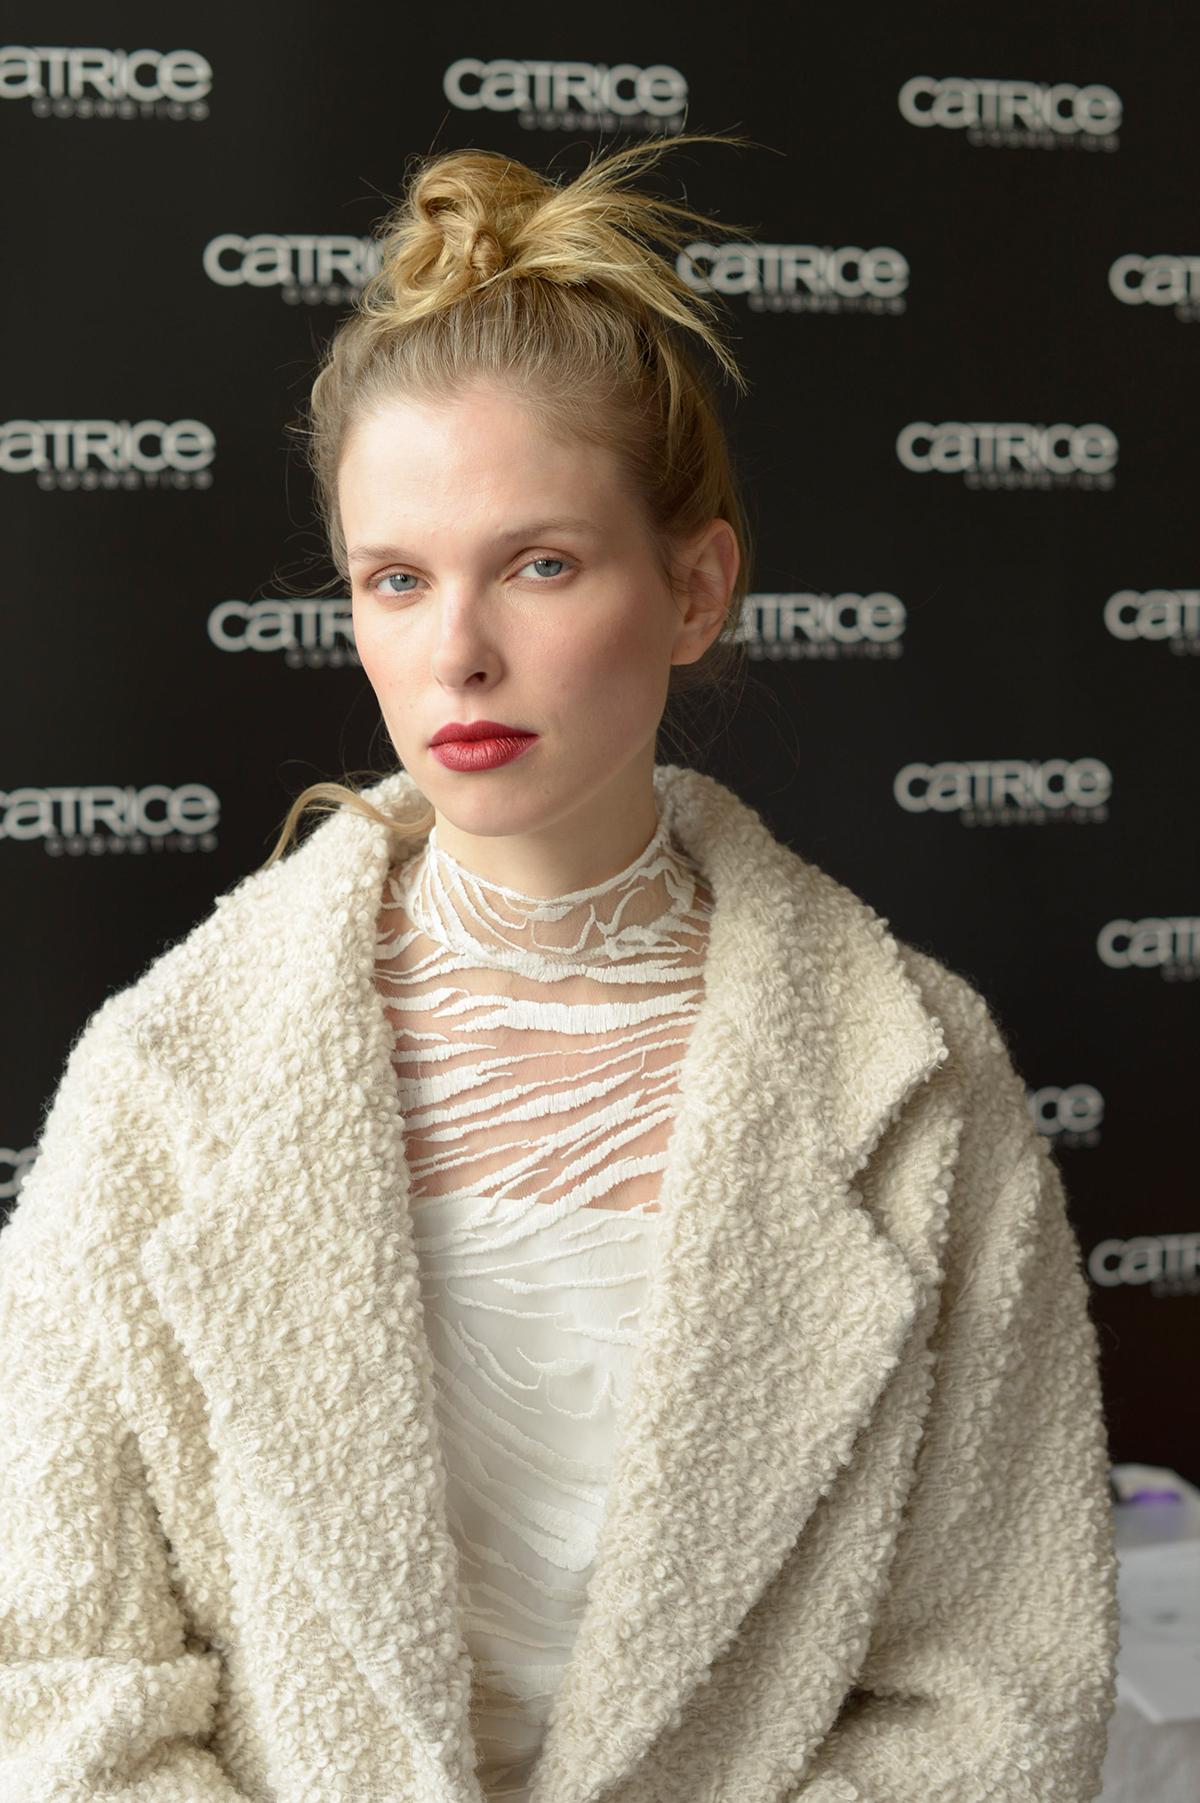 Lala Berlin FW 16/17 / Catrice Make-up / Foxycheeks